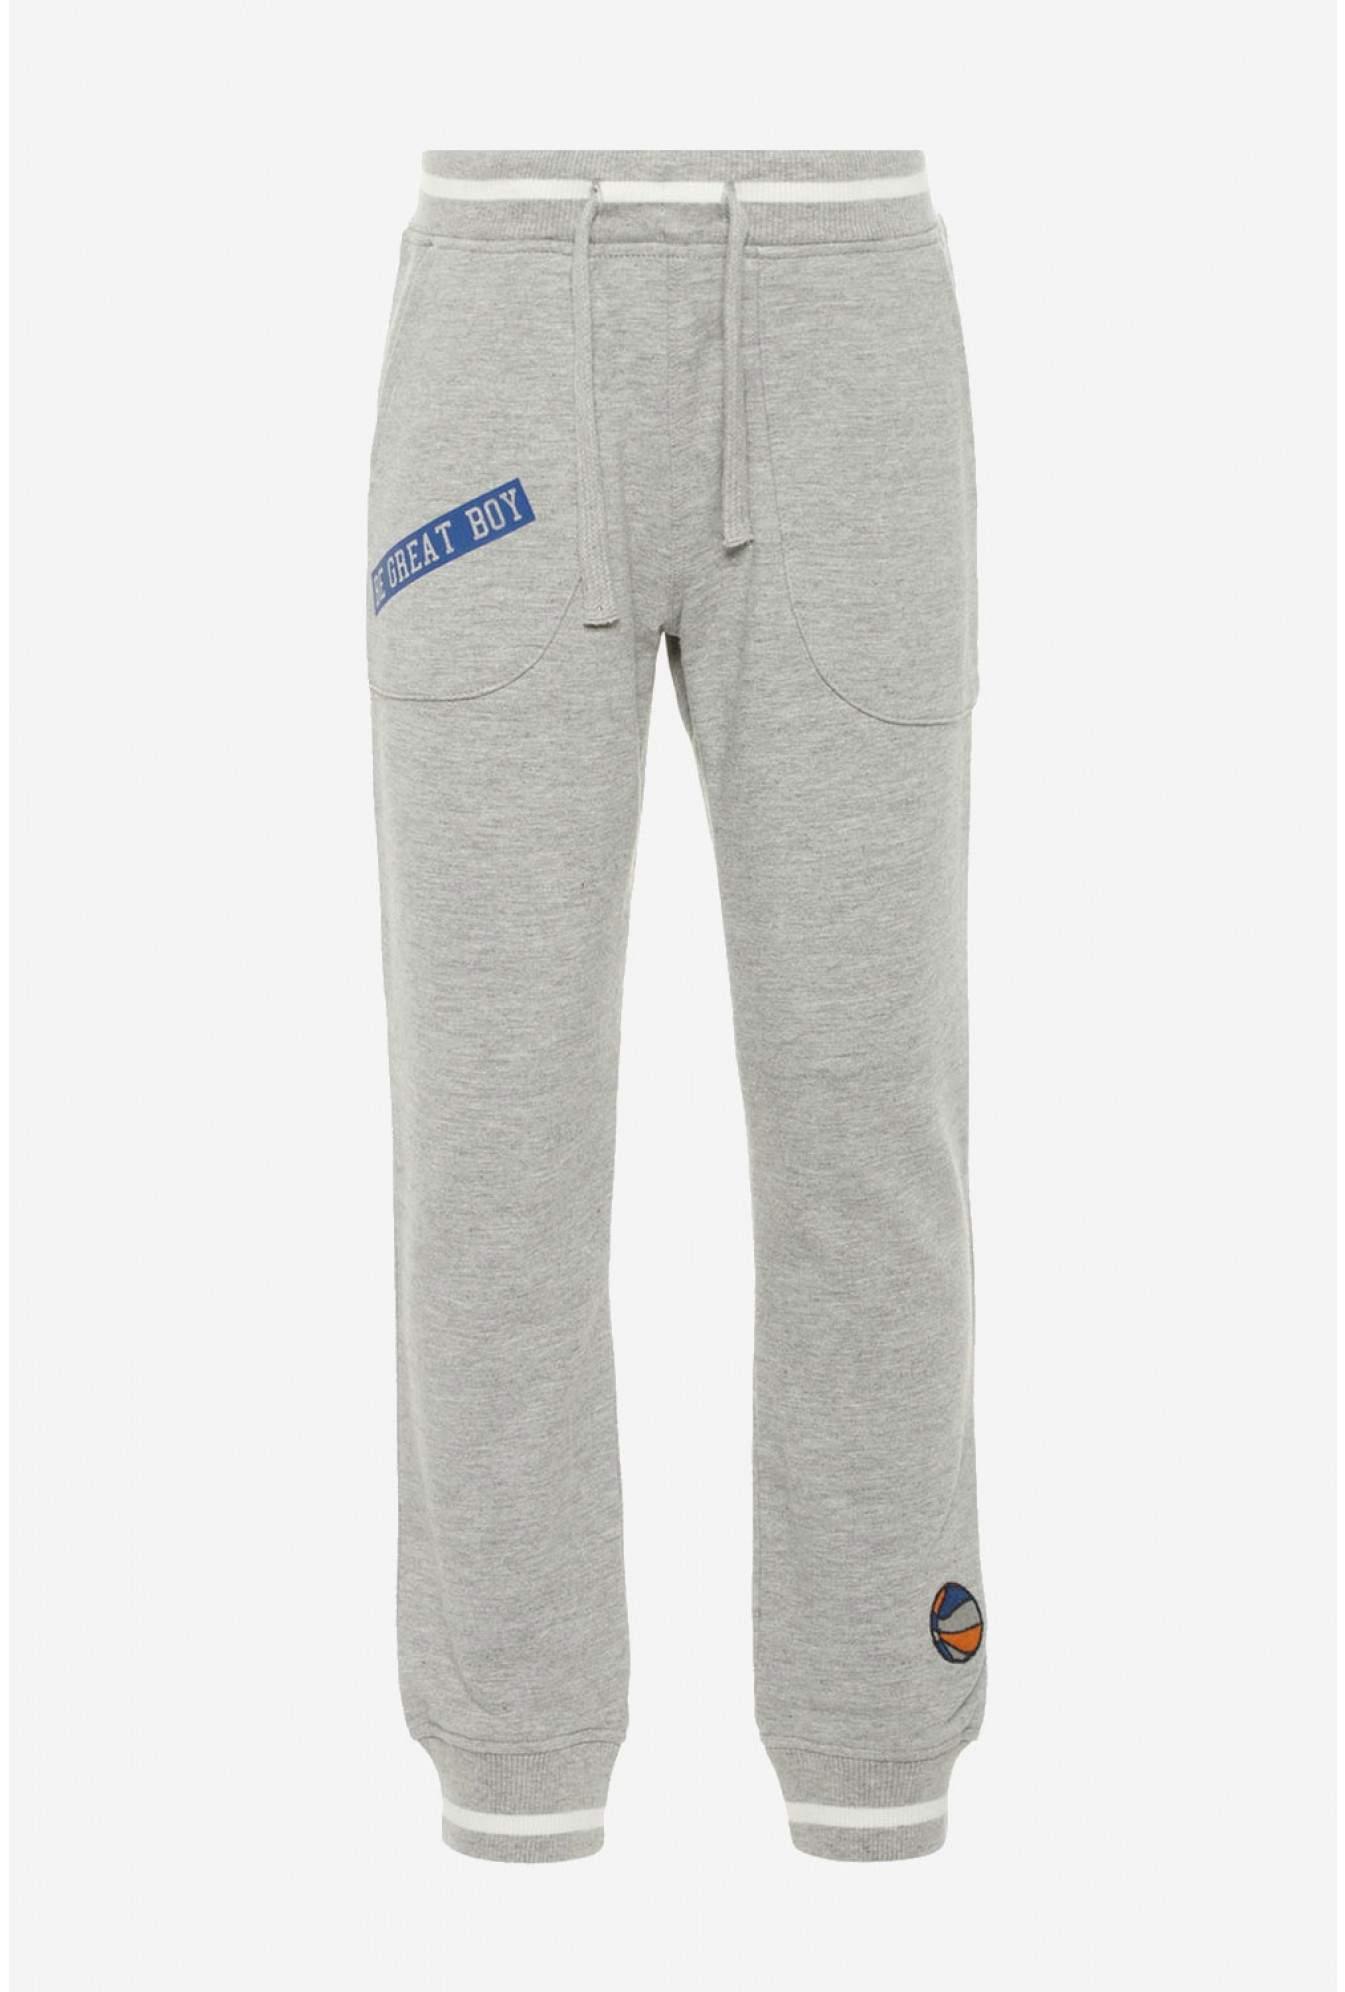 d1bd97e41db9 Name It Nadir Boys Sweat Pants in Grey